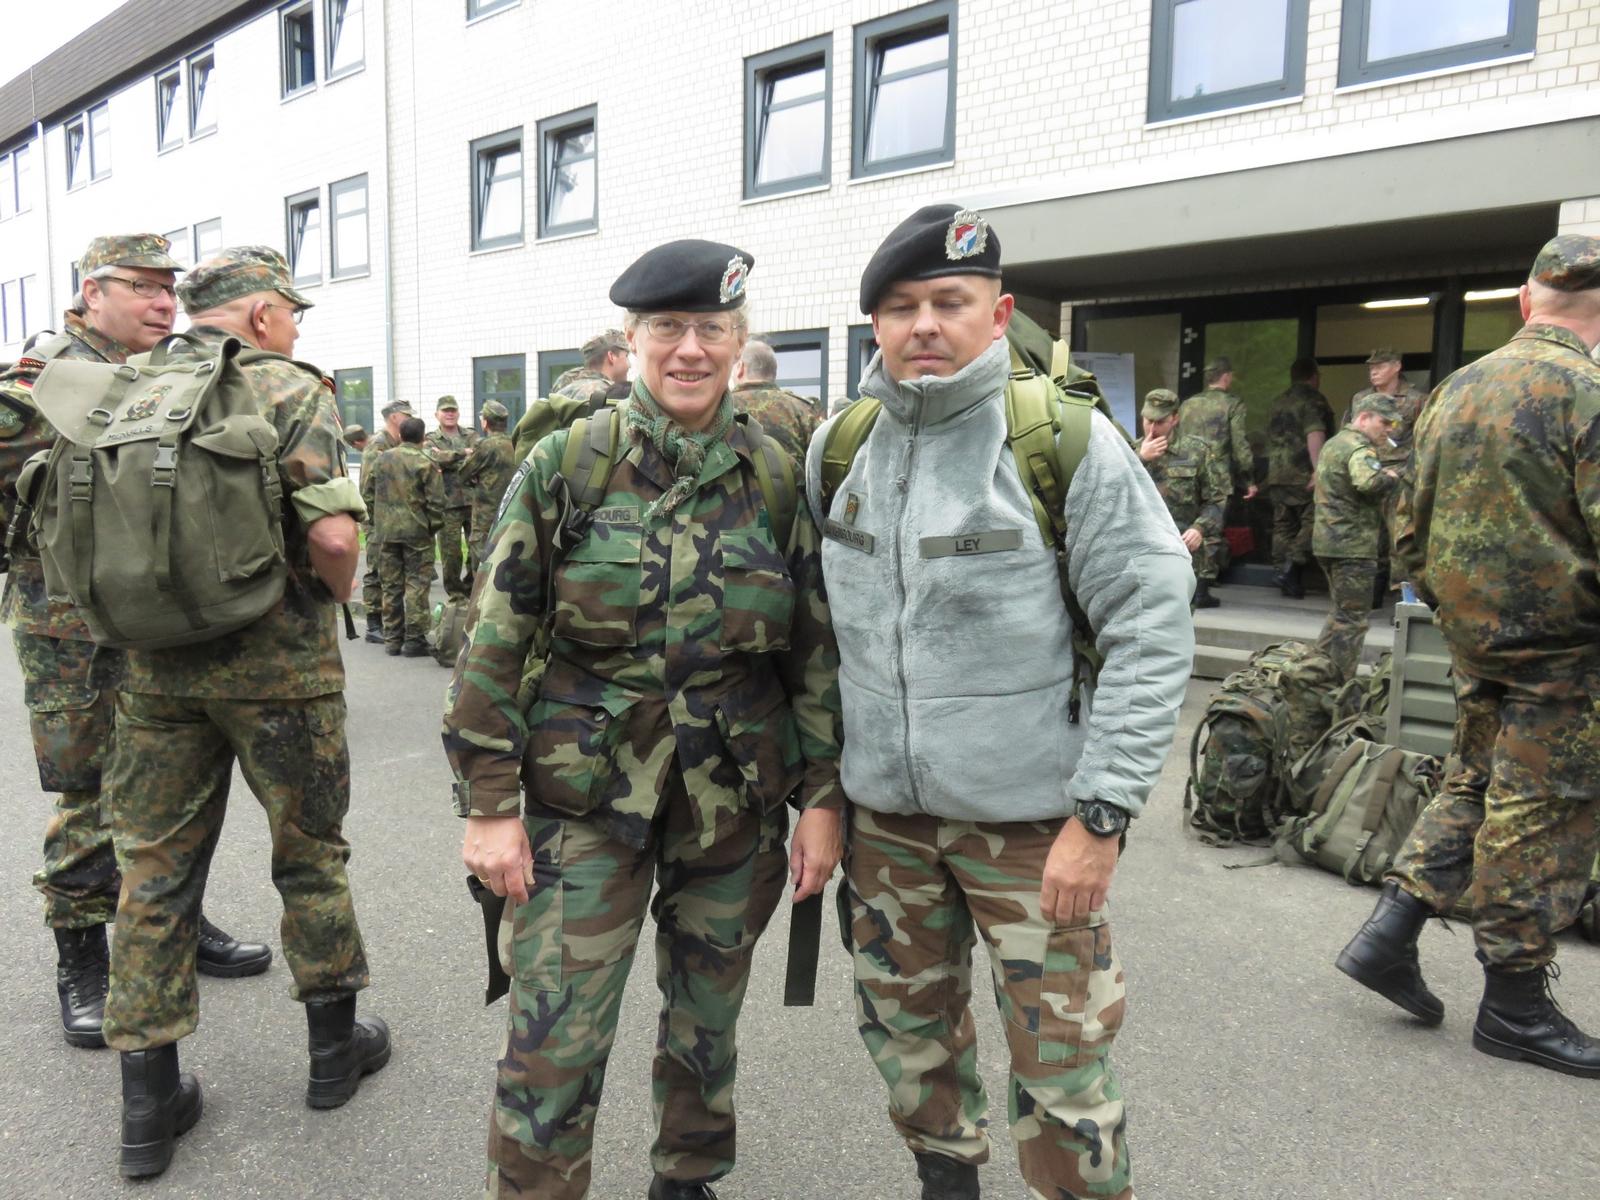 Leistungsmarsch Bonn Bad Godesberg (D) 14-05-2016